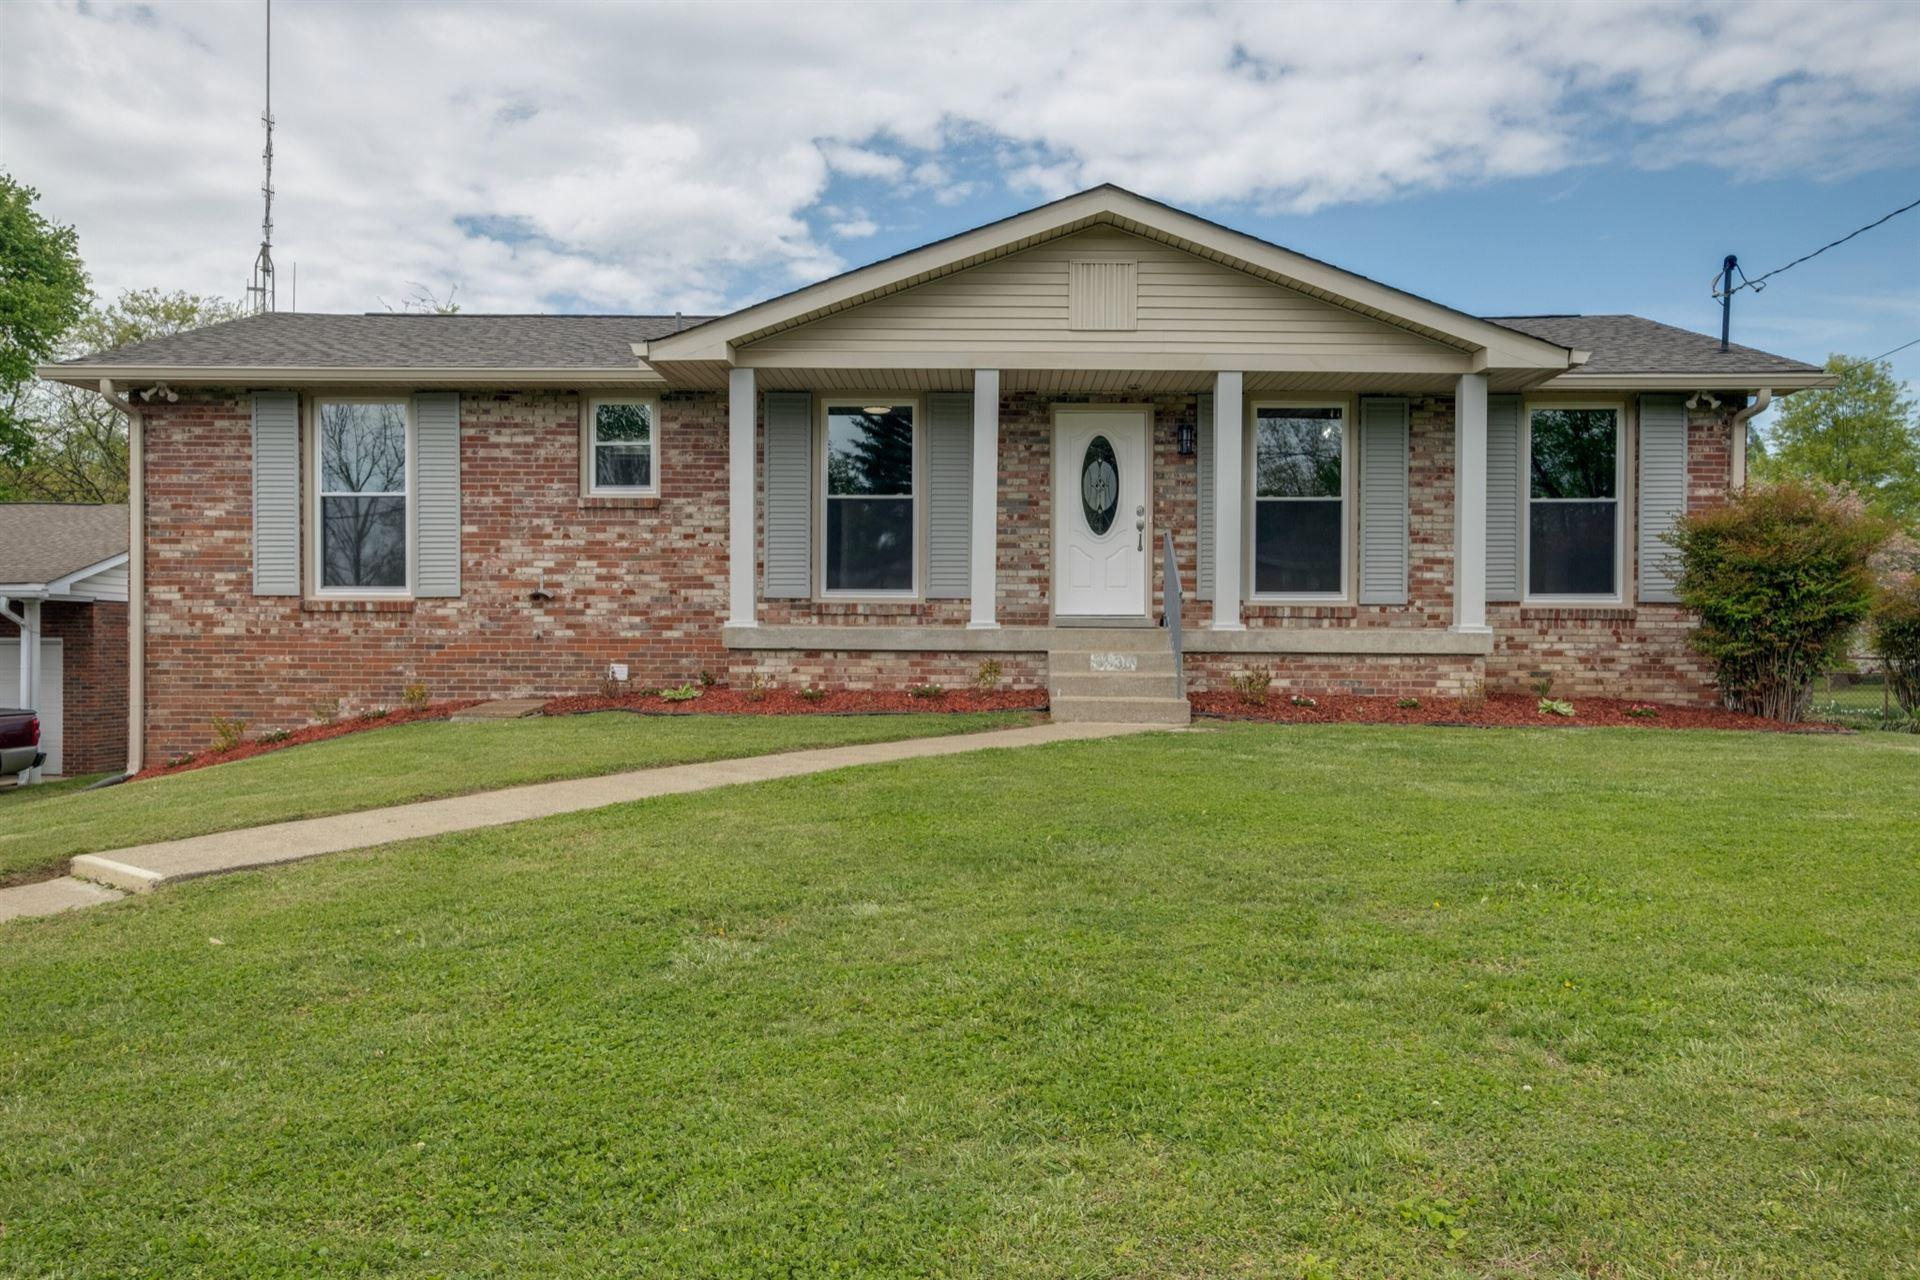 4536 Andrew Jackson Pkwy, Hermitage, TN 37076 - MLS#: 2246138